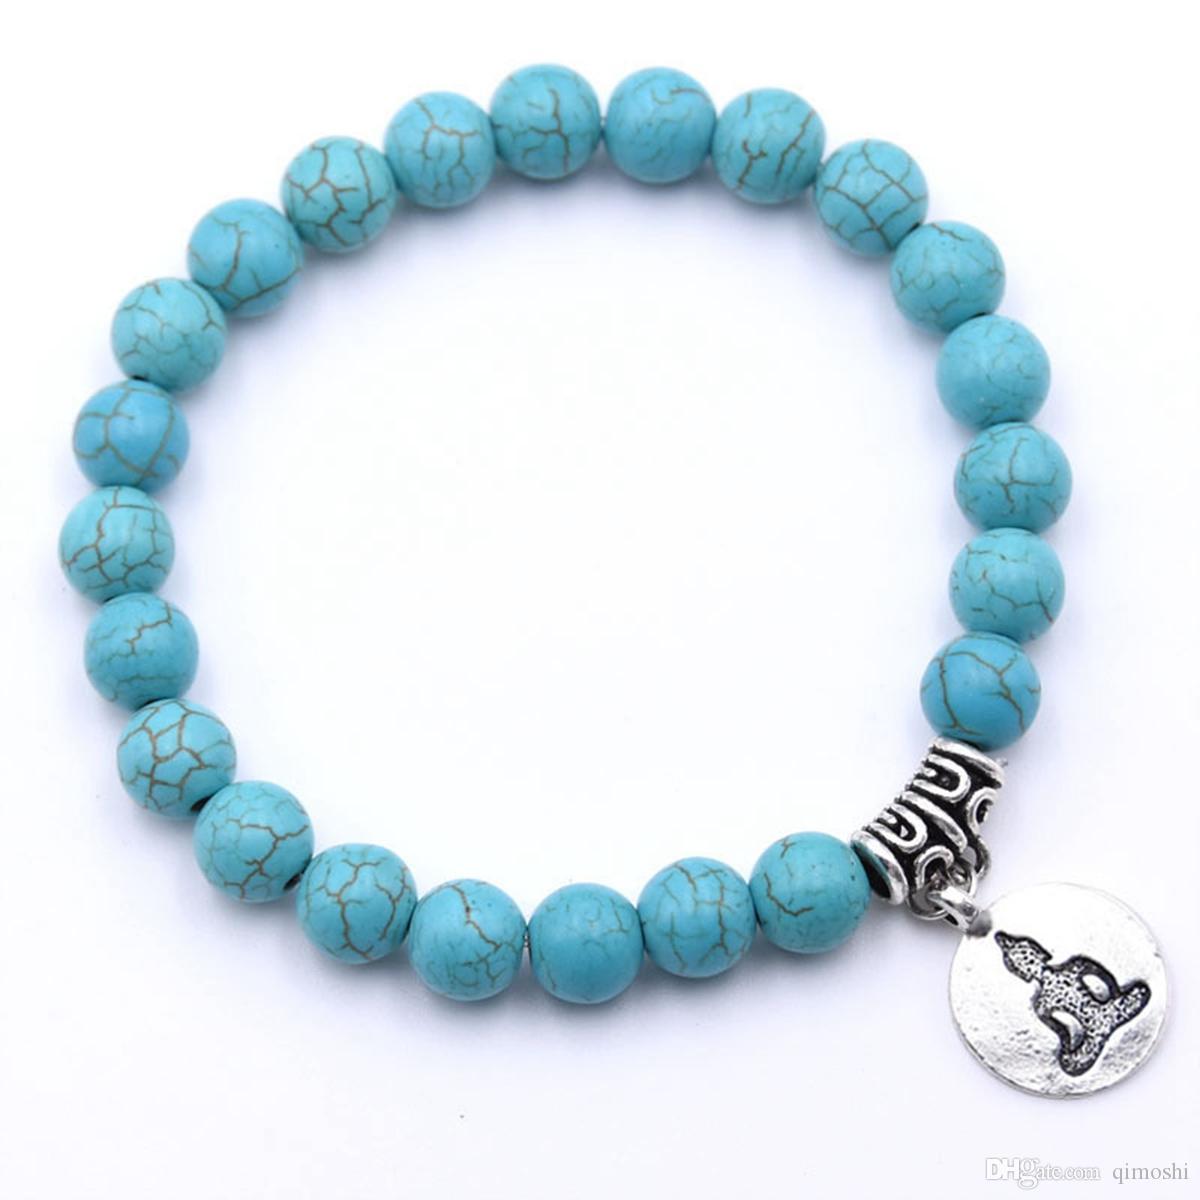 Real Lava Rock Bracelet Ladies Essential Oil Aromatherapy Ideal Stress and Anxiety Buddha Bracelet Meditation Yoga Jewelry